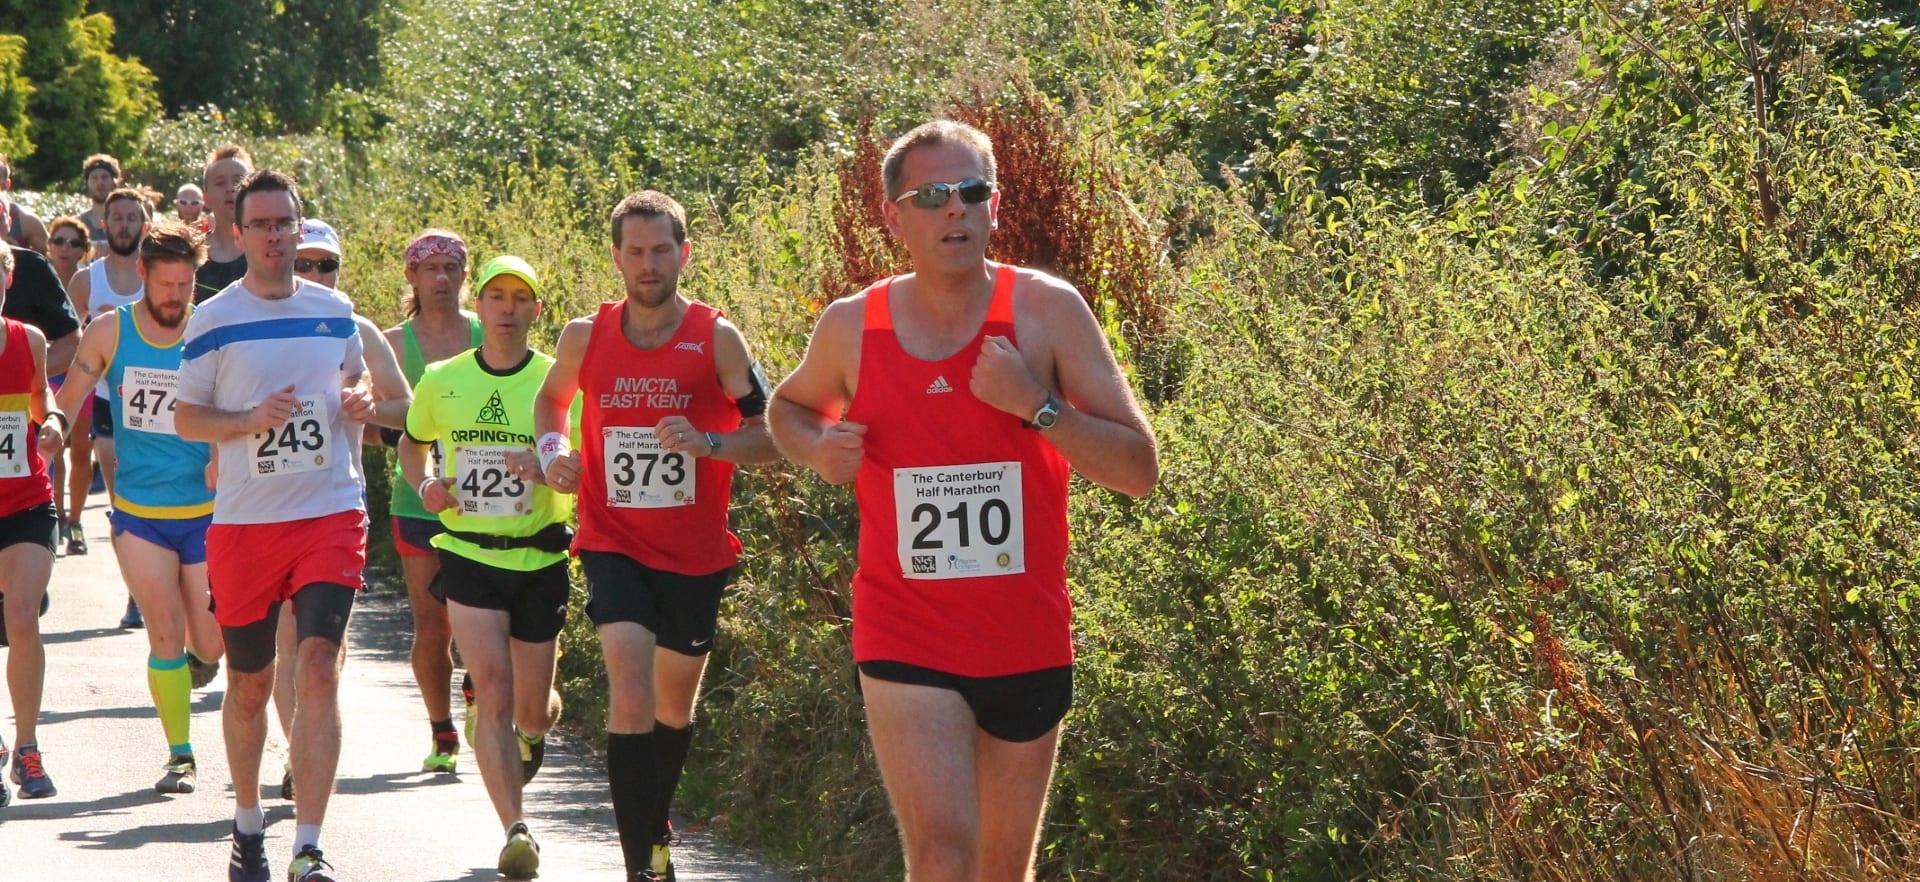 The Carsington Water Half Marathon & 10k